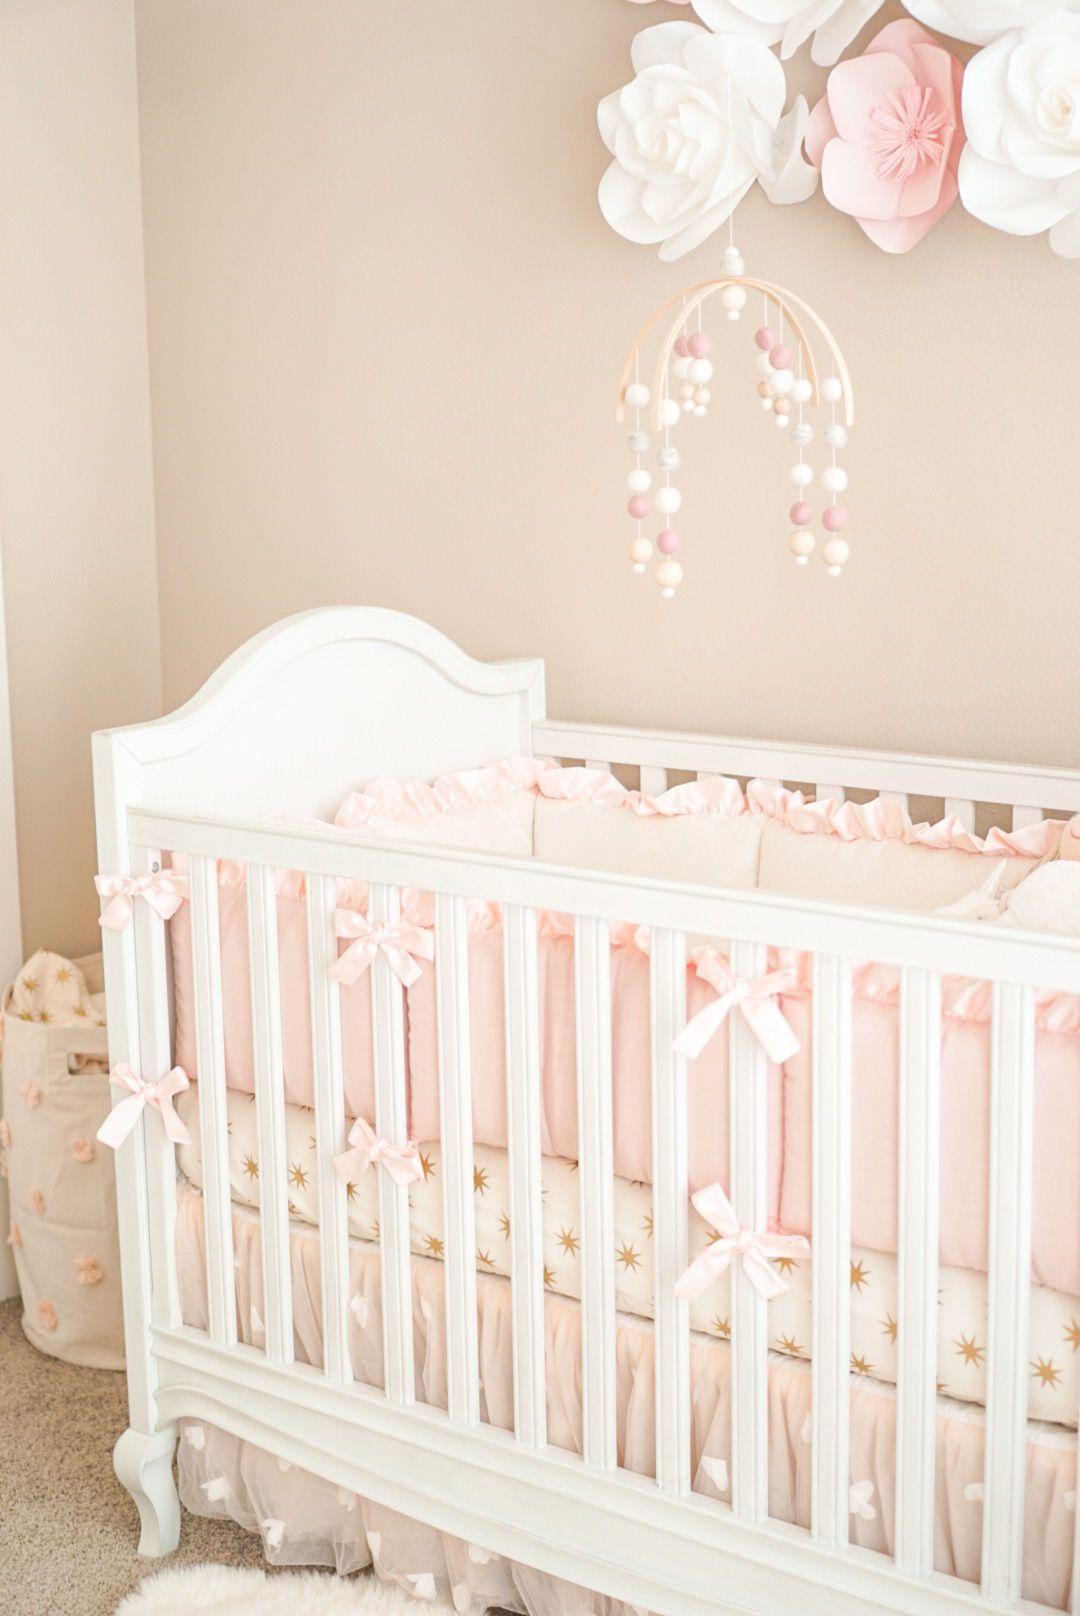 MY BABY GIRL'S NURSERY Baby nursery decor, Pottery barn